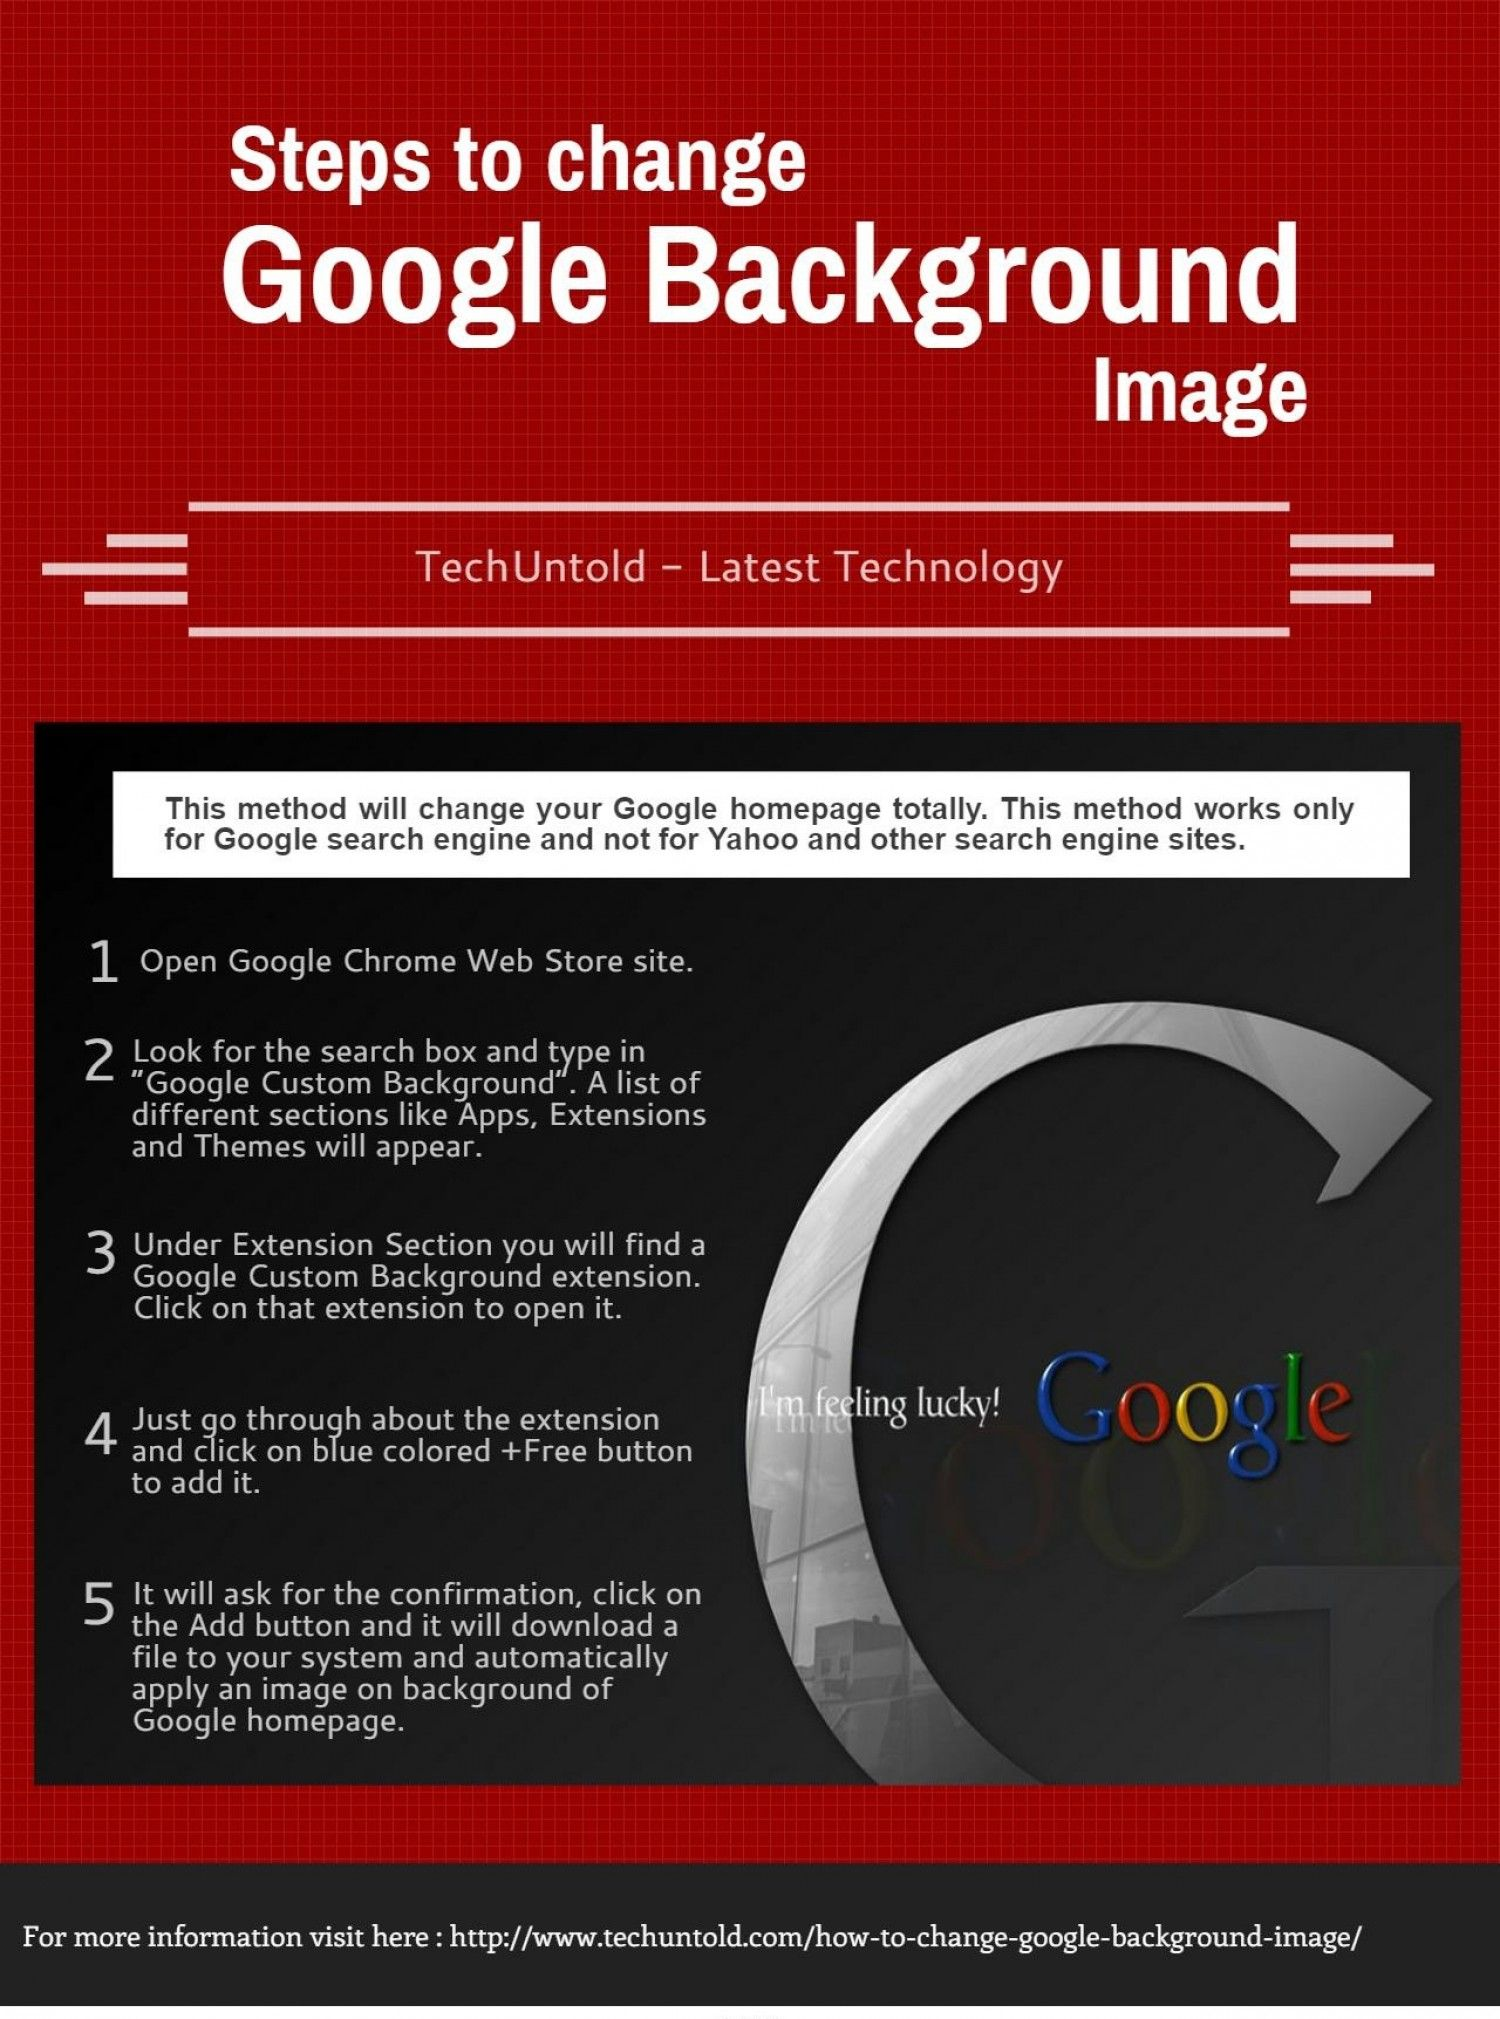 steps to change google background image infographic internet